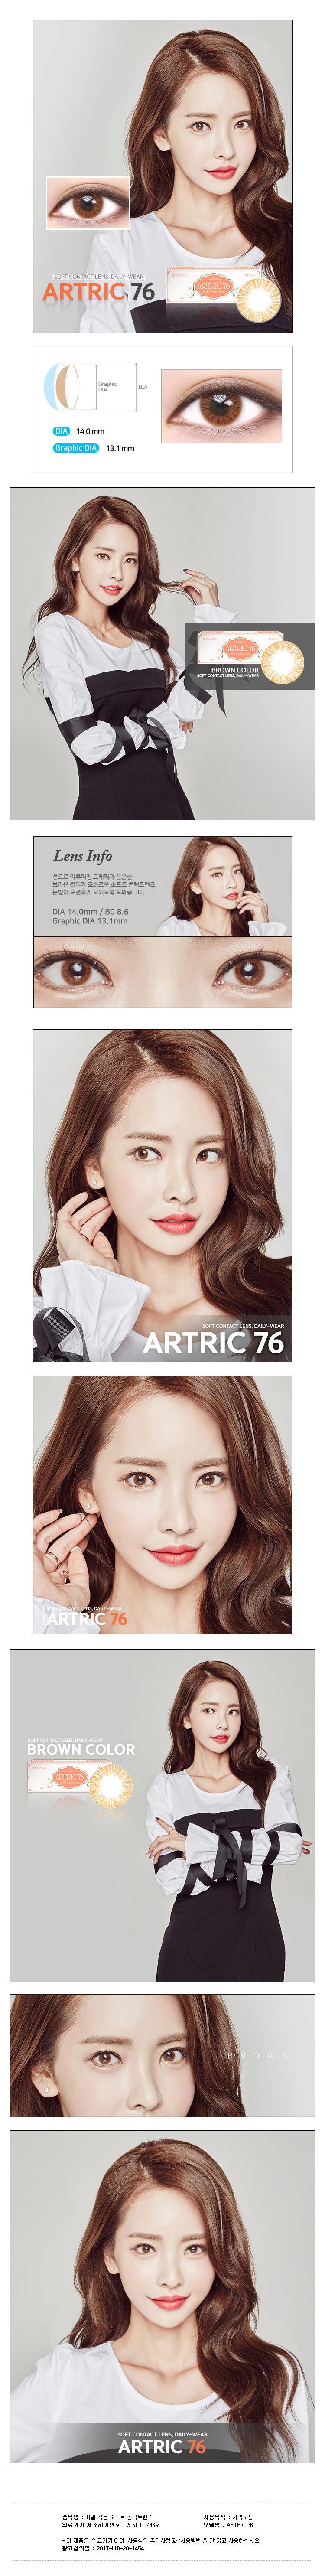 artric763mthsbrown.jpg